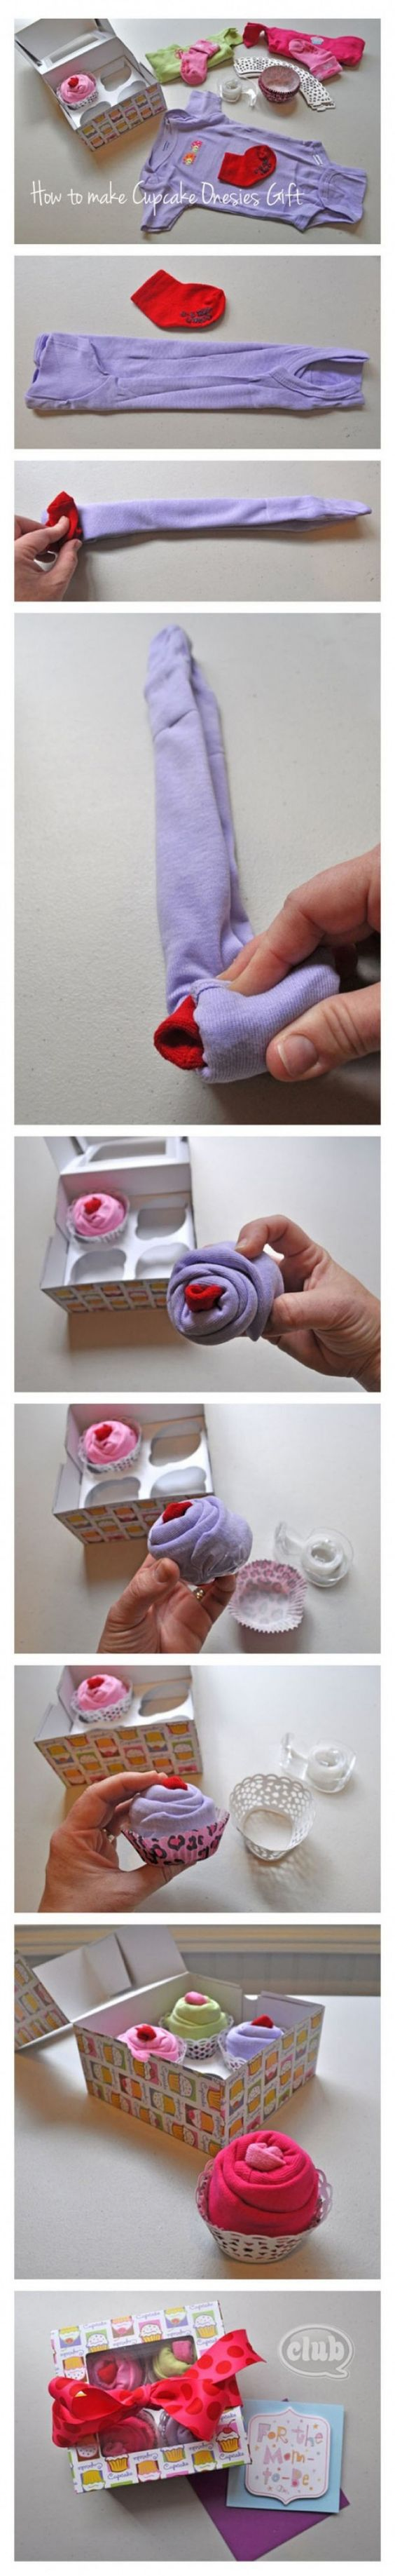 s e idee als geschenk f r meine beste freundin wrapping. Black Bedroom Furniture Sets. Home Design Ideas